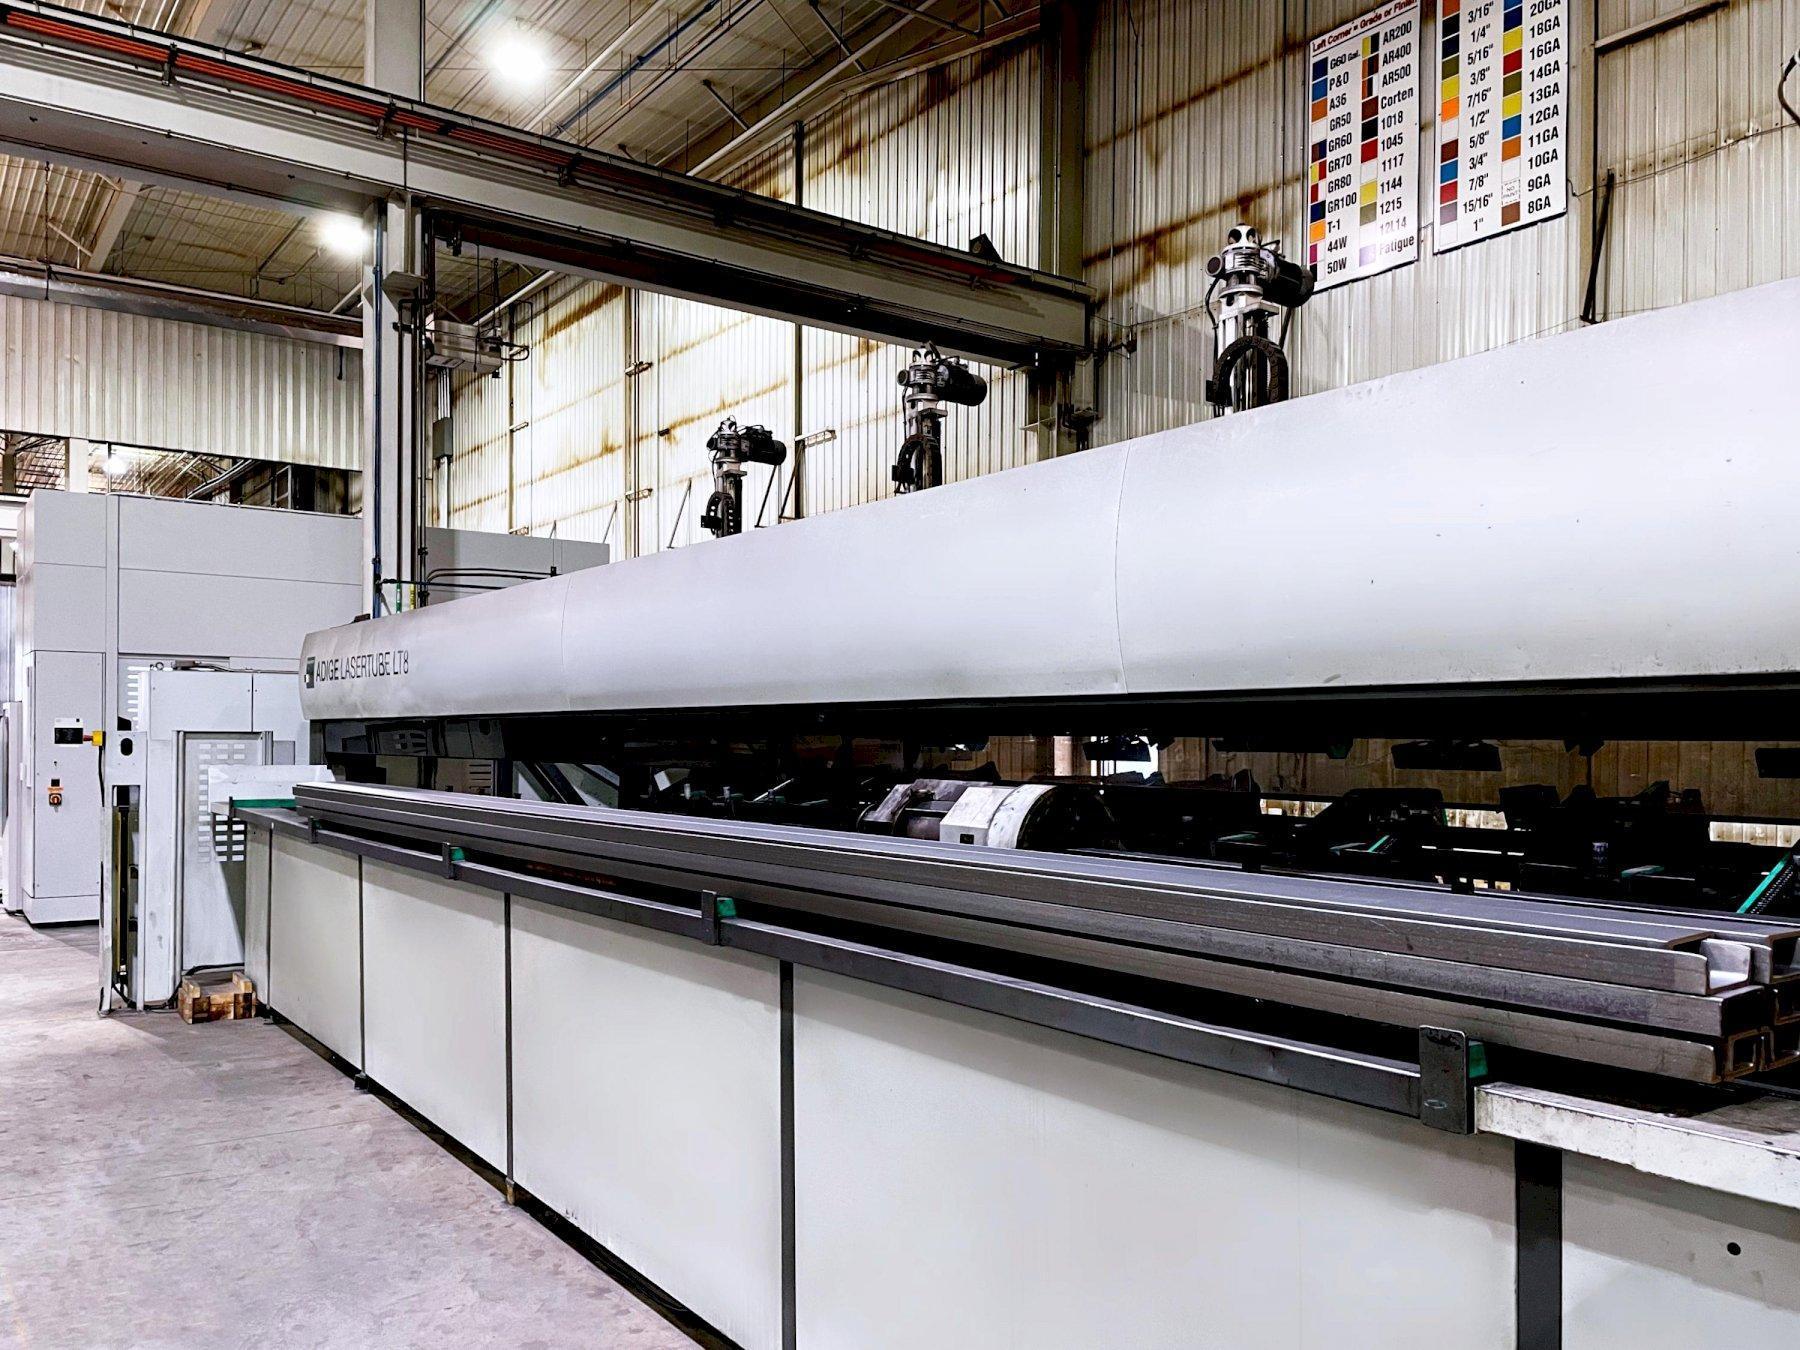 BLM LT8 2012 CO2 Tube Laser with Tilt (3D) Cutting